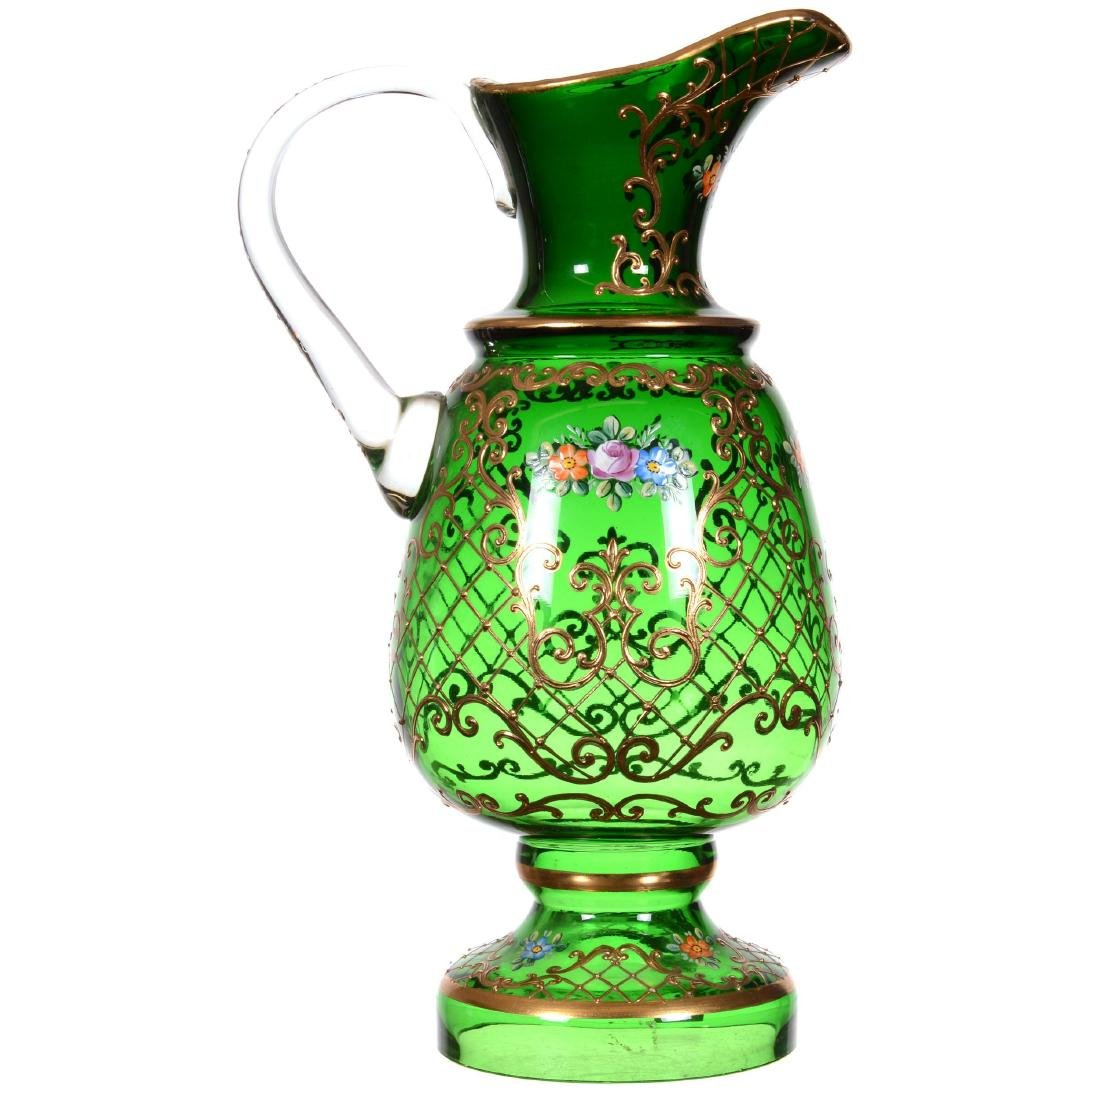 Bohemian Art Glass Pedestal Display Ewer